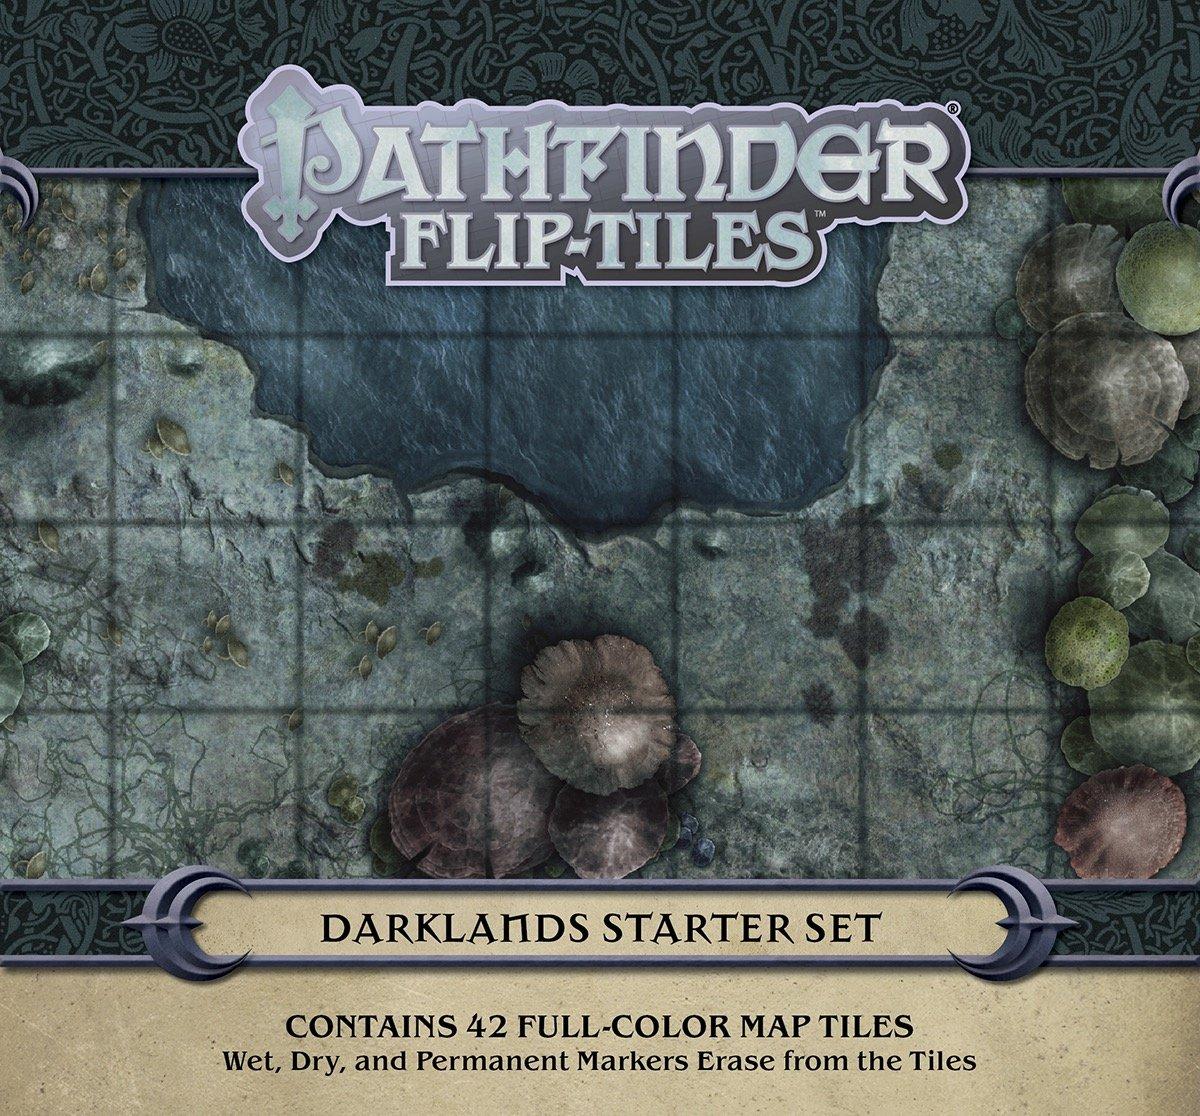 Pathfinder RPG: Flip-Tiles - Darklands Starter Set